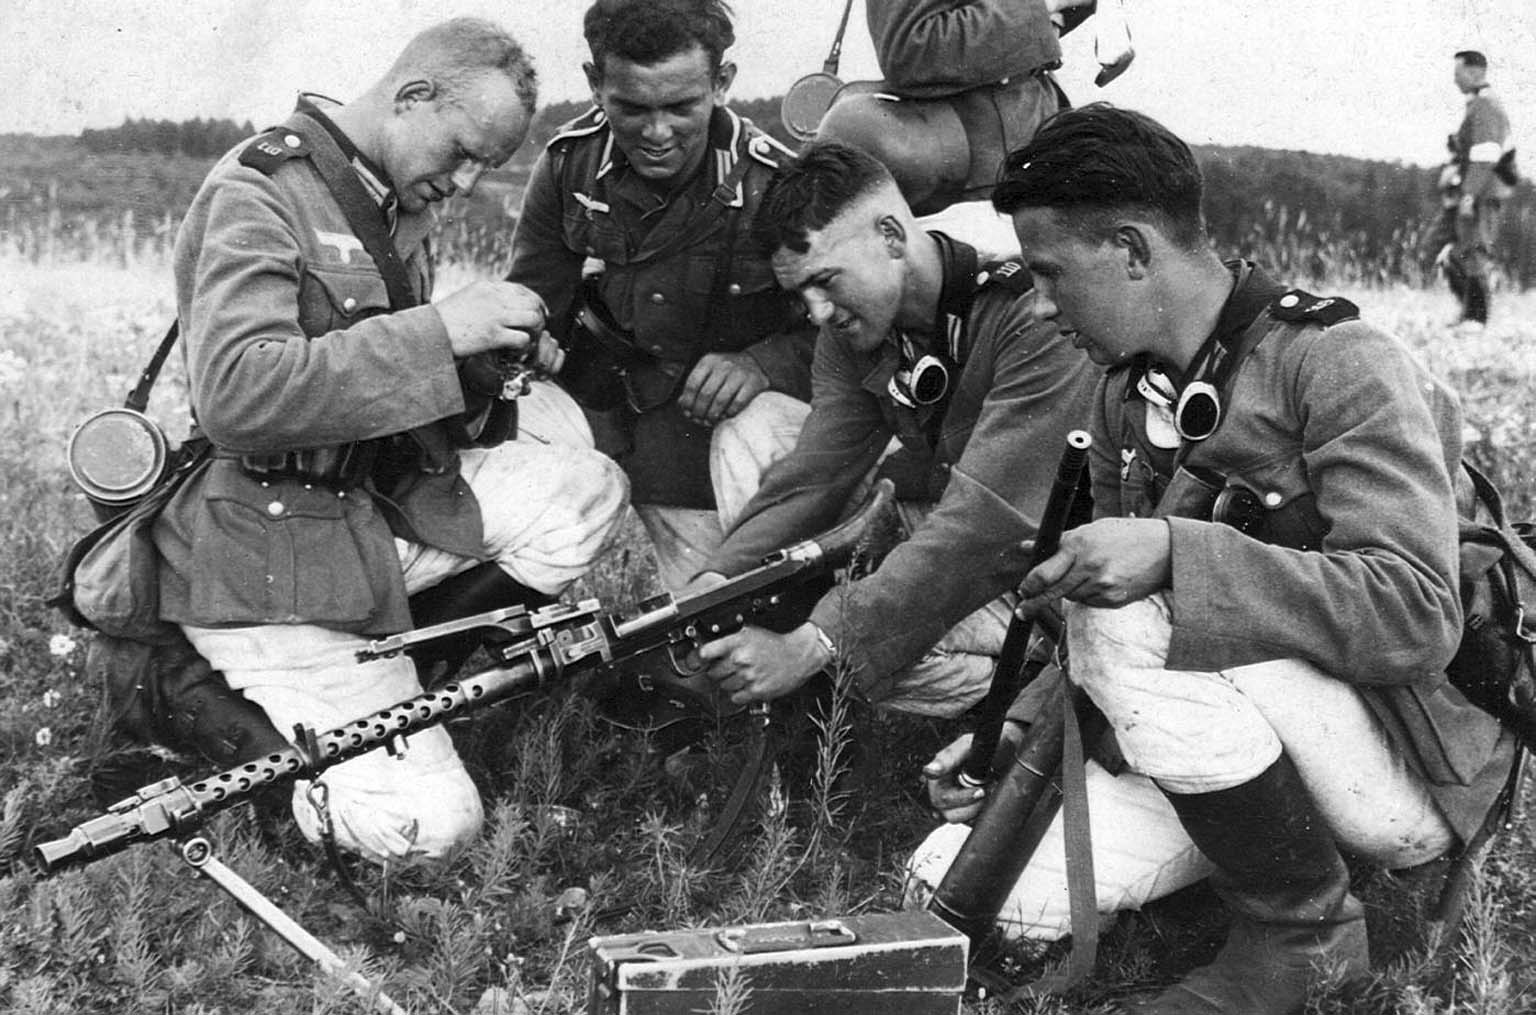 MG.34 machine gun